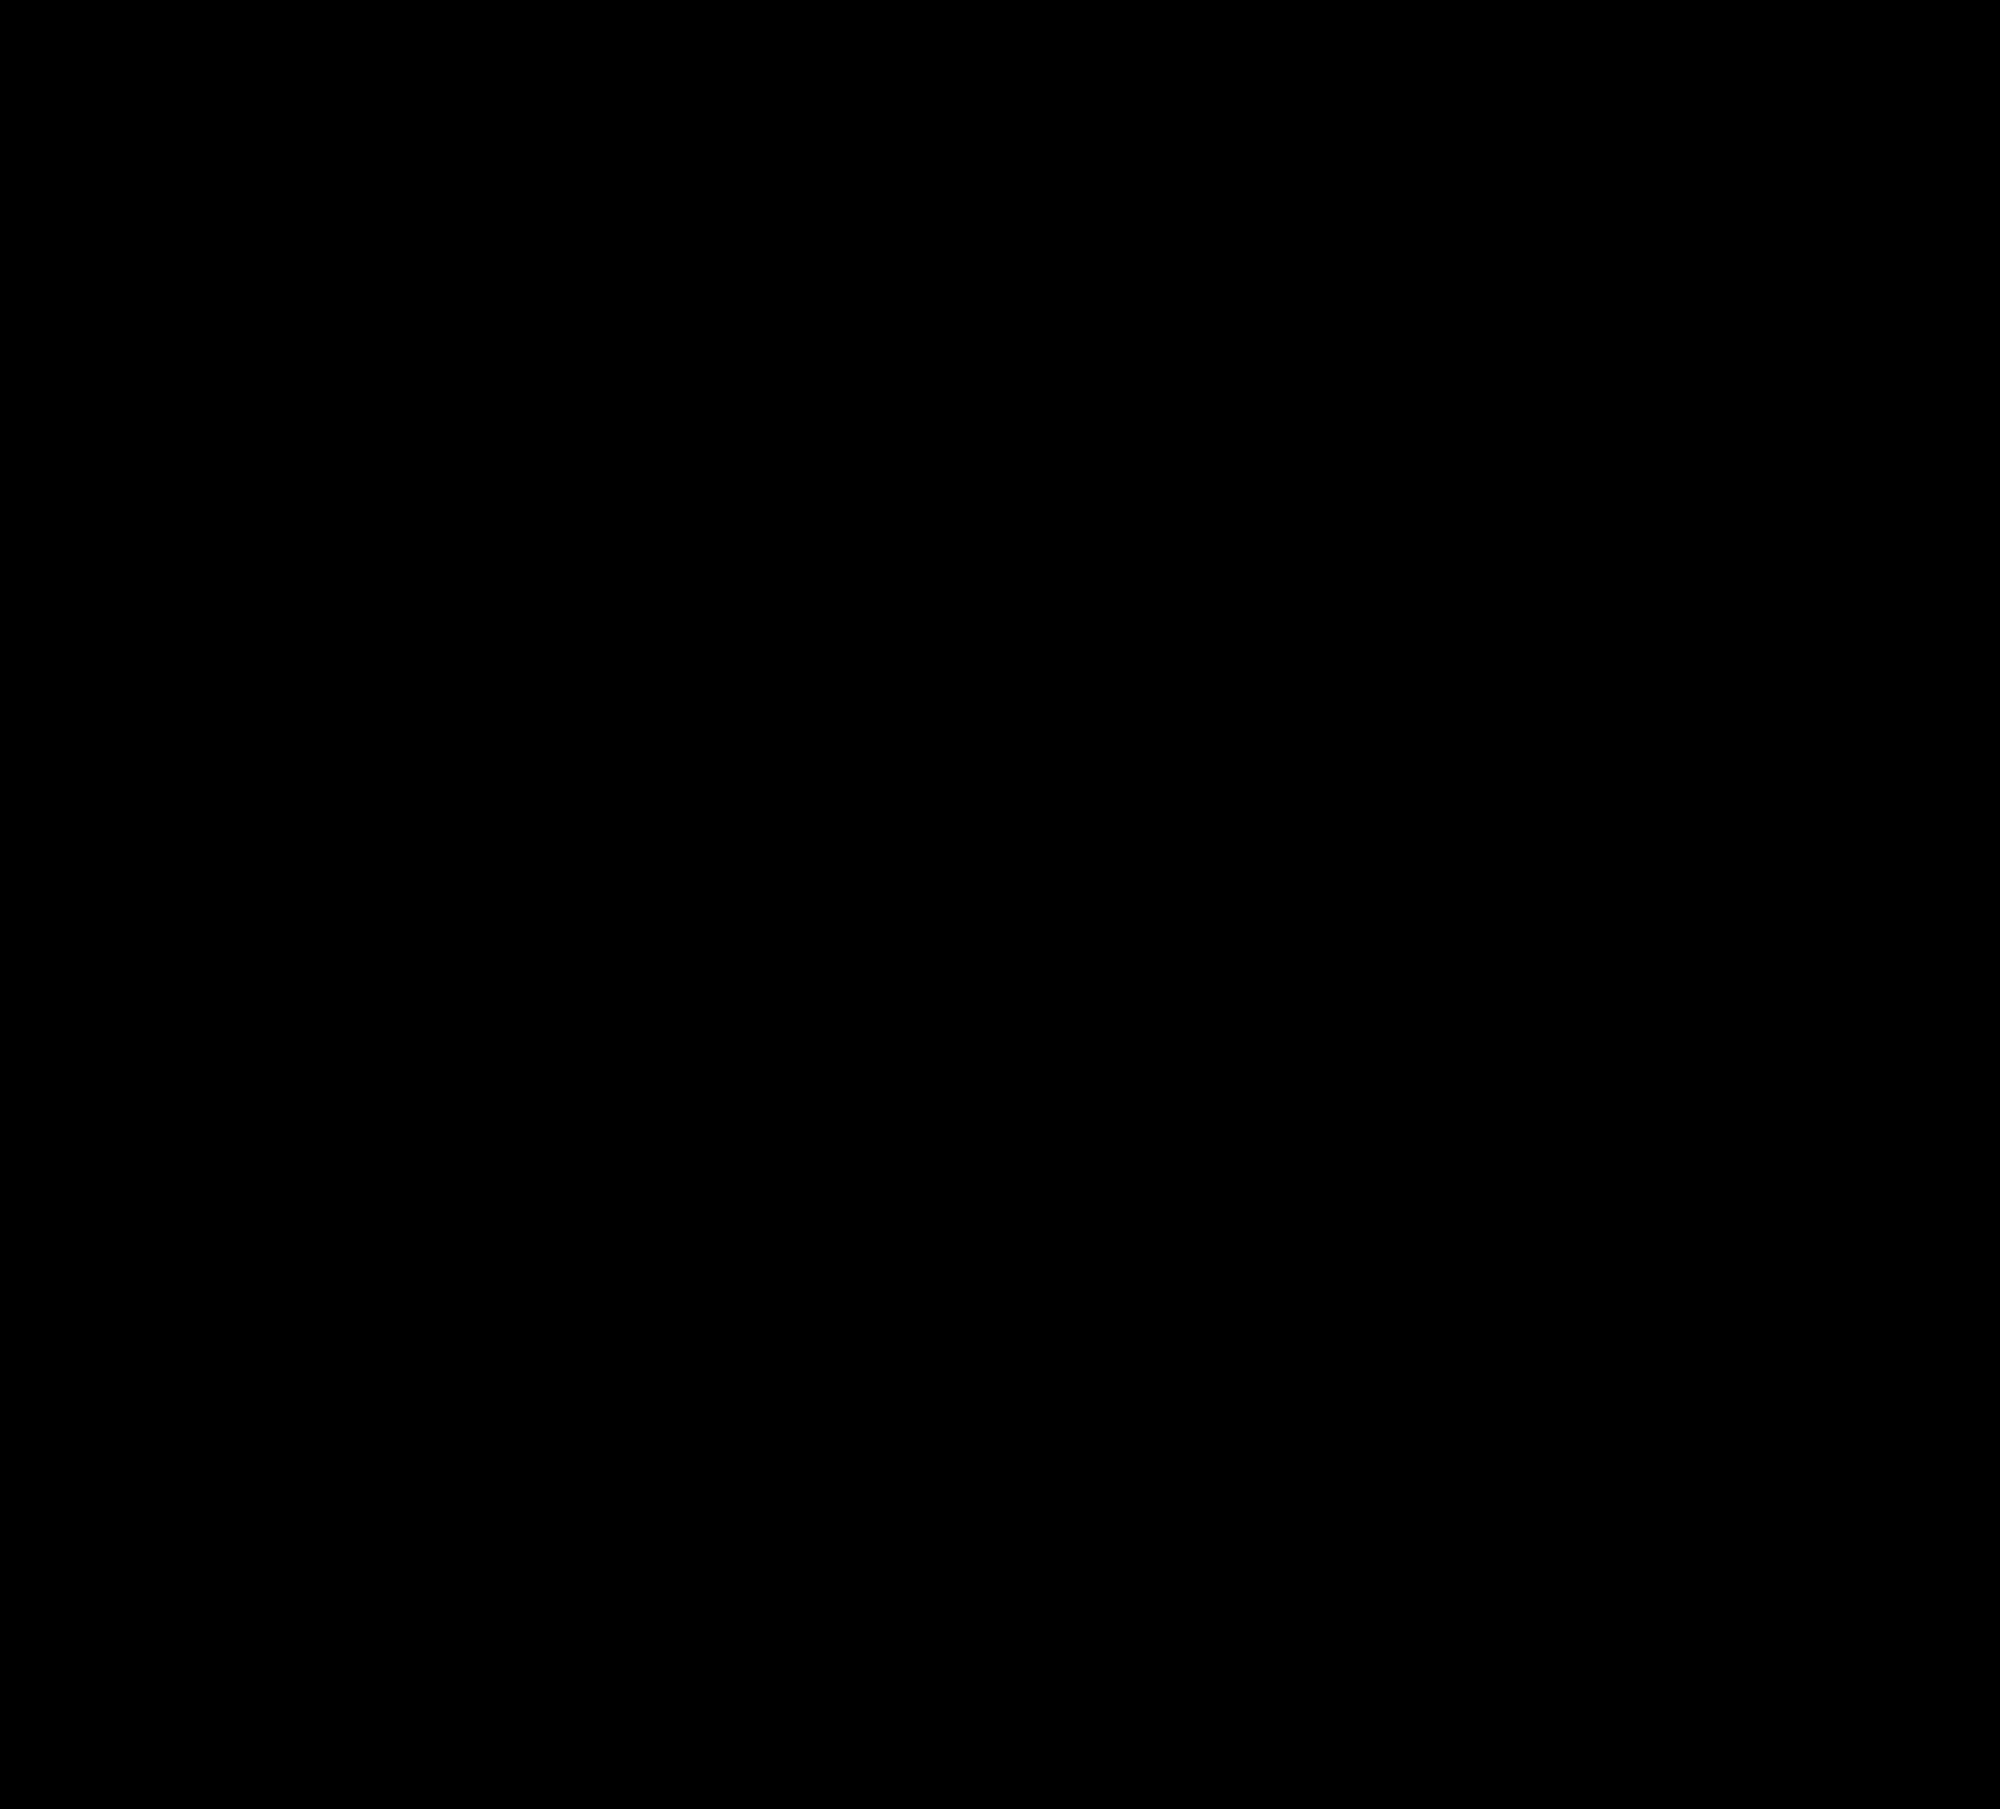 image black and white stock Using svg css. File html styling wikimedia